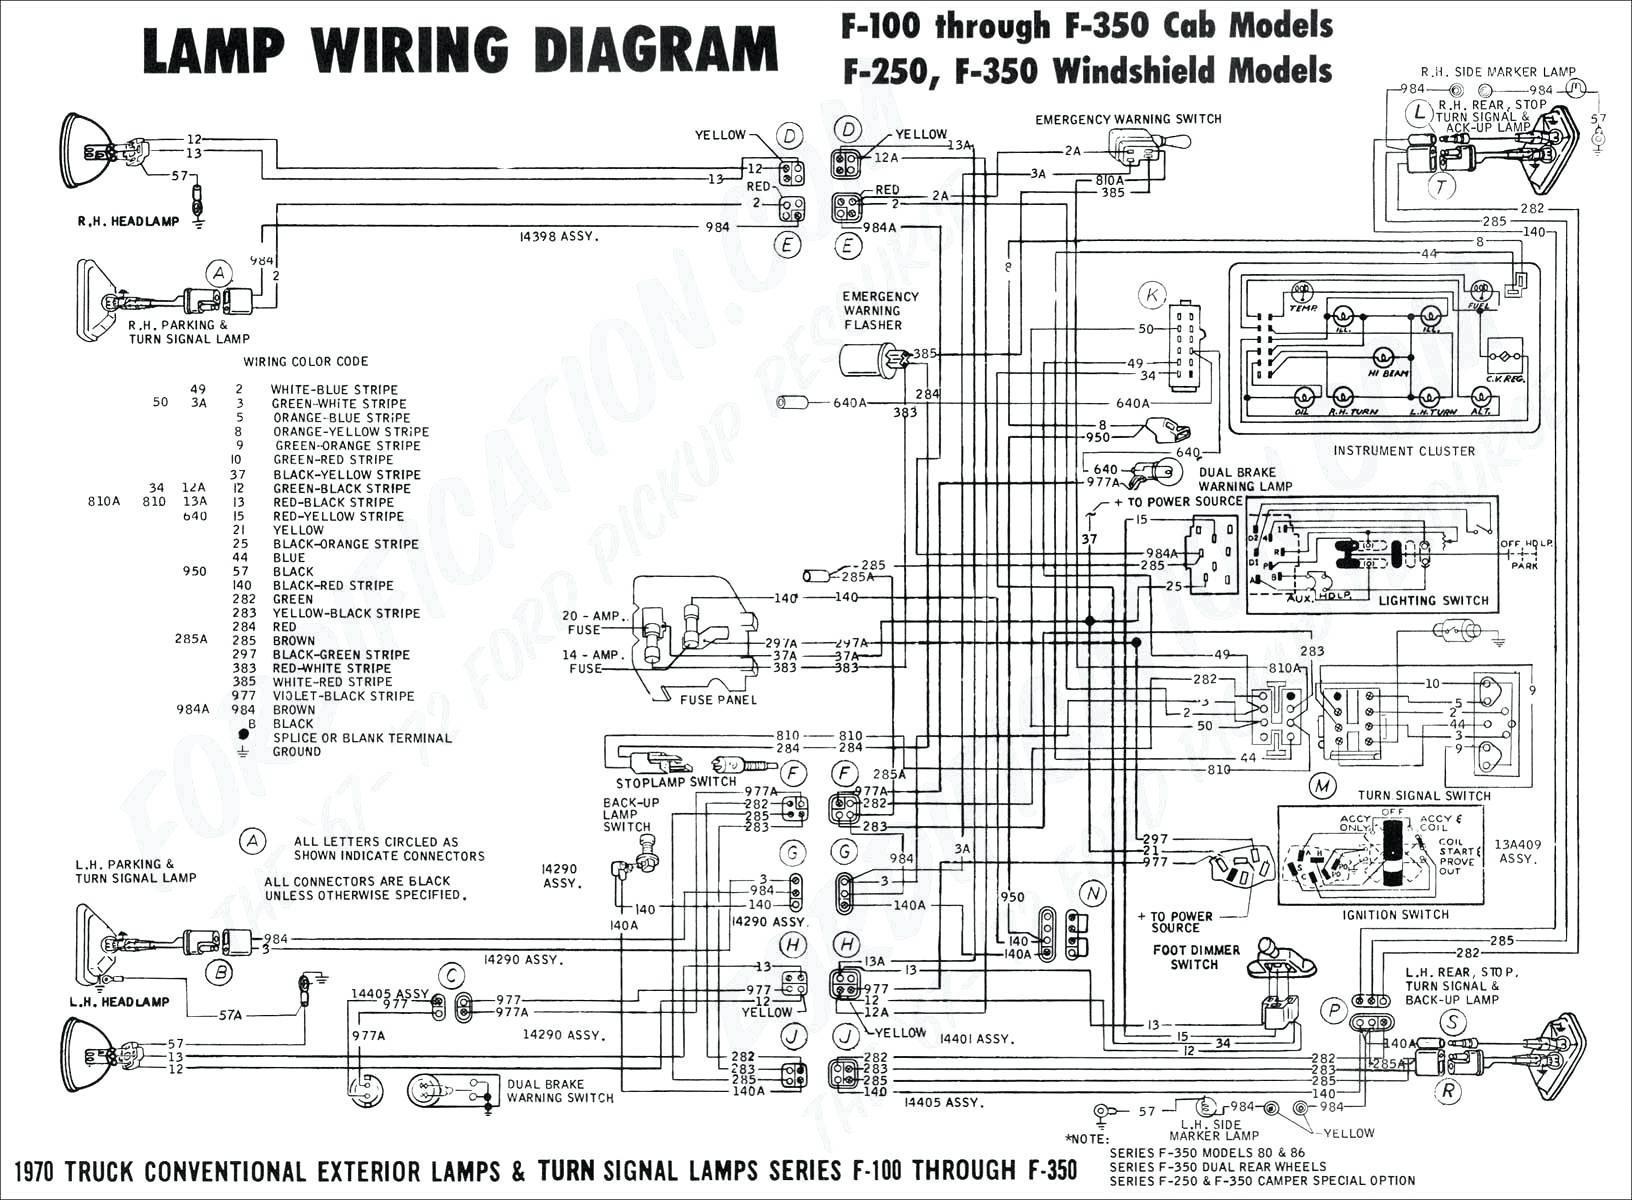 Ford 4 6 Engine Diagram 2 ford 460 Engine Diagram Wiring Diagram for You Of Ford 4 6 Engine Diagram 2